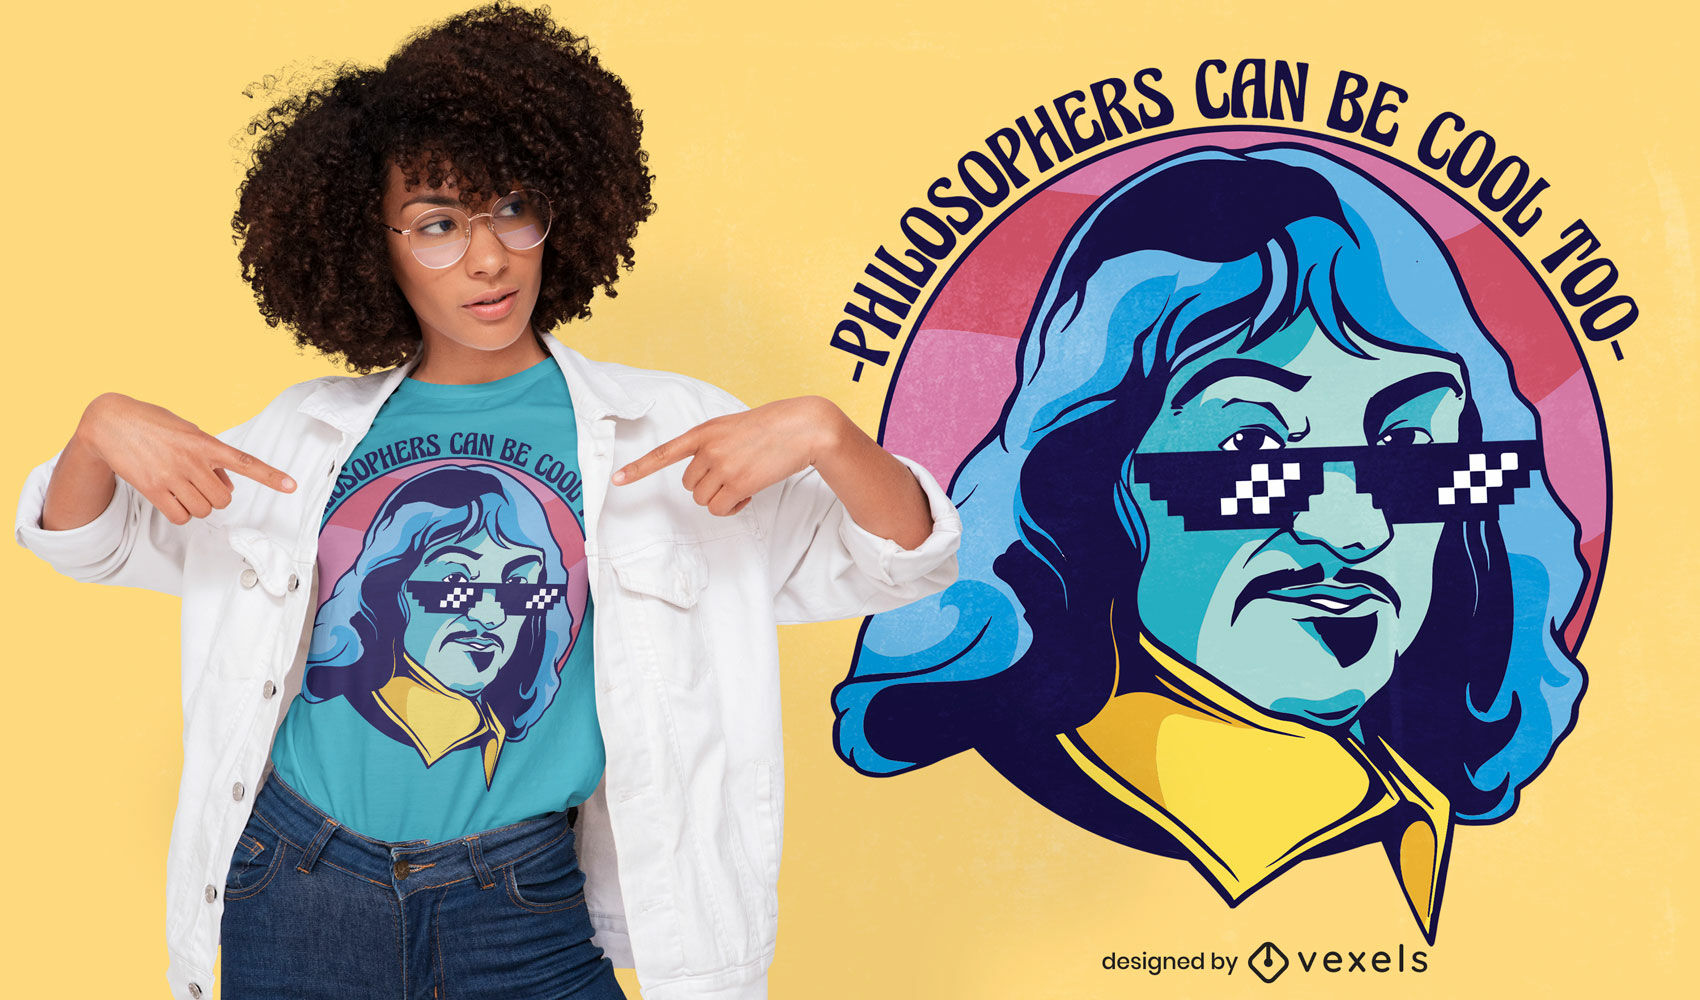 Genial dise?o de camiseta del fil?sofo Descartes.